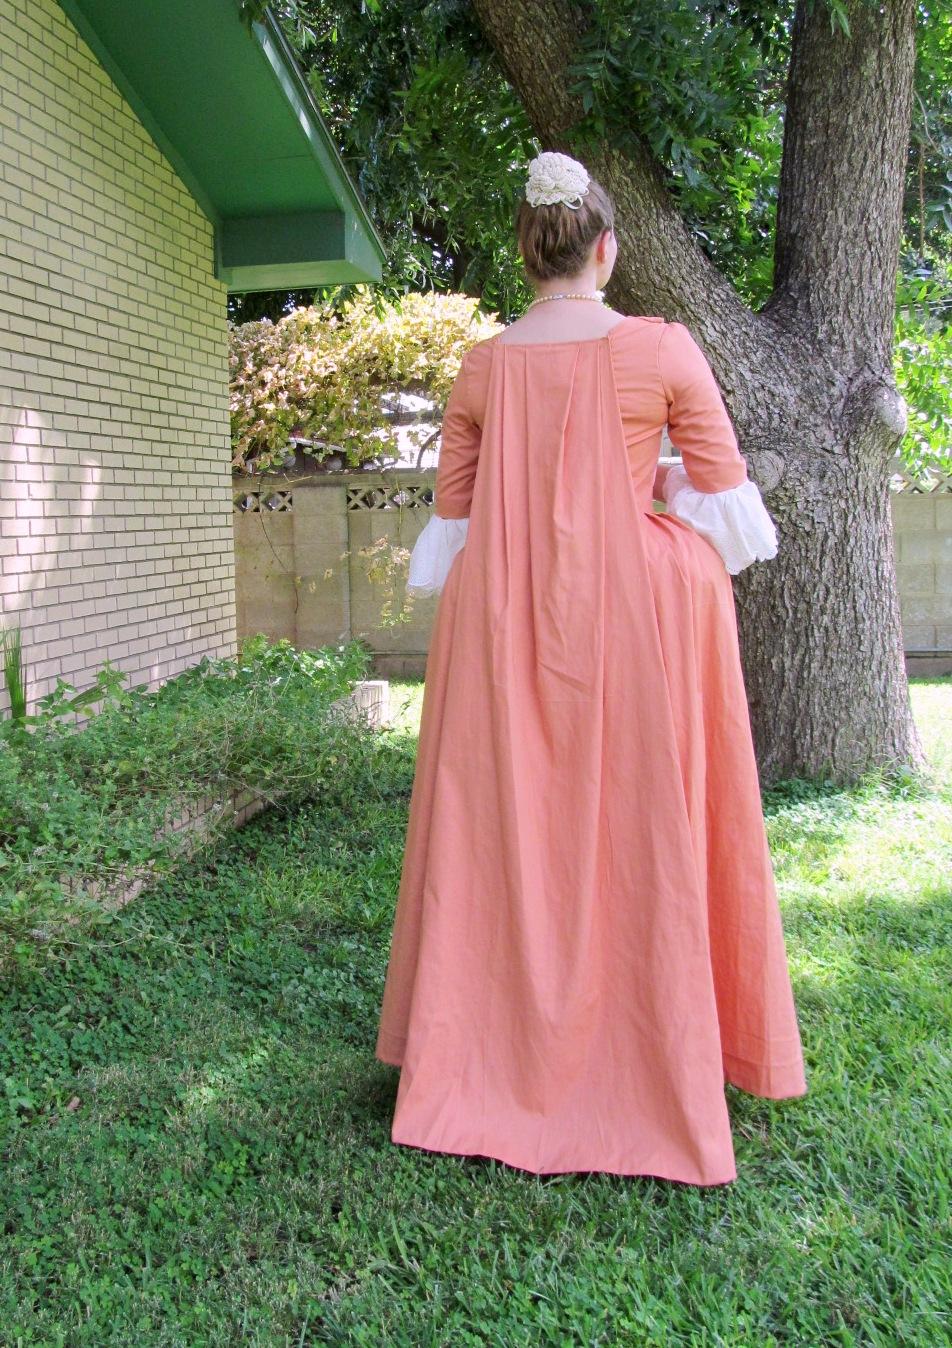 watteau pleats – The Pragmatic Costumer